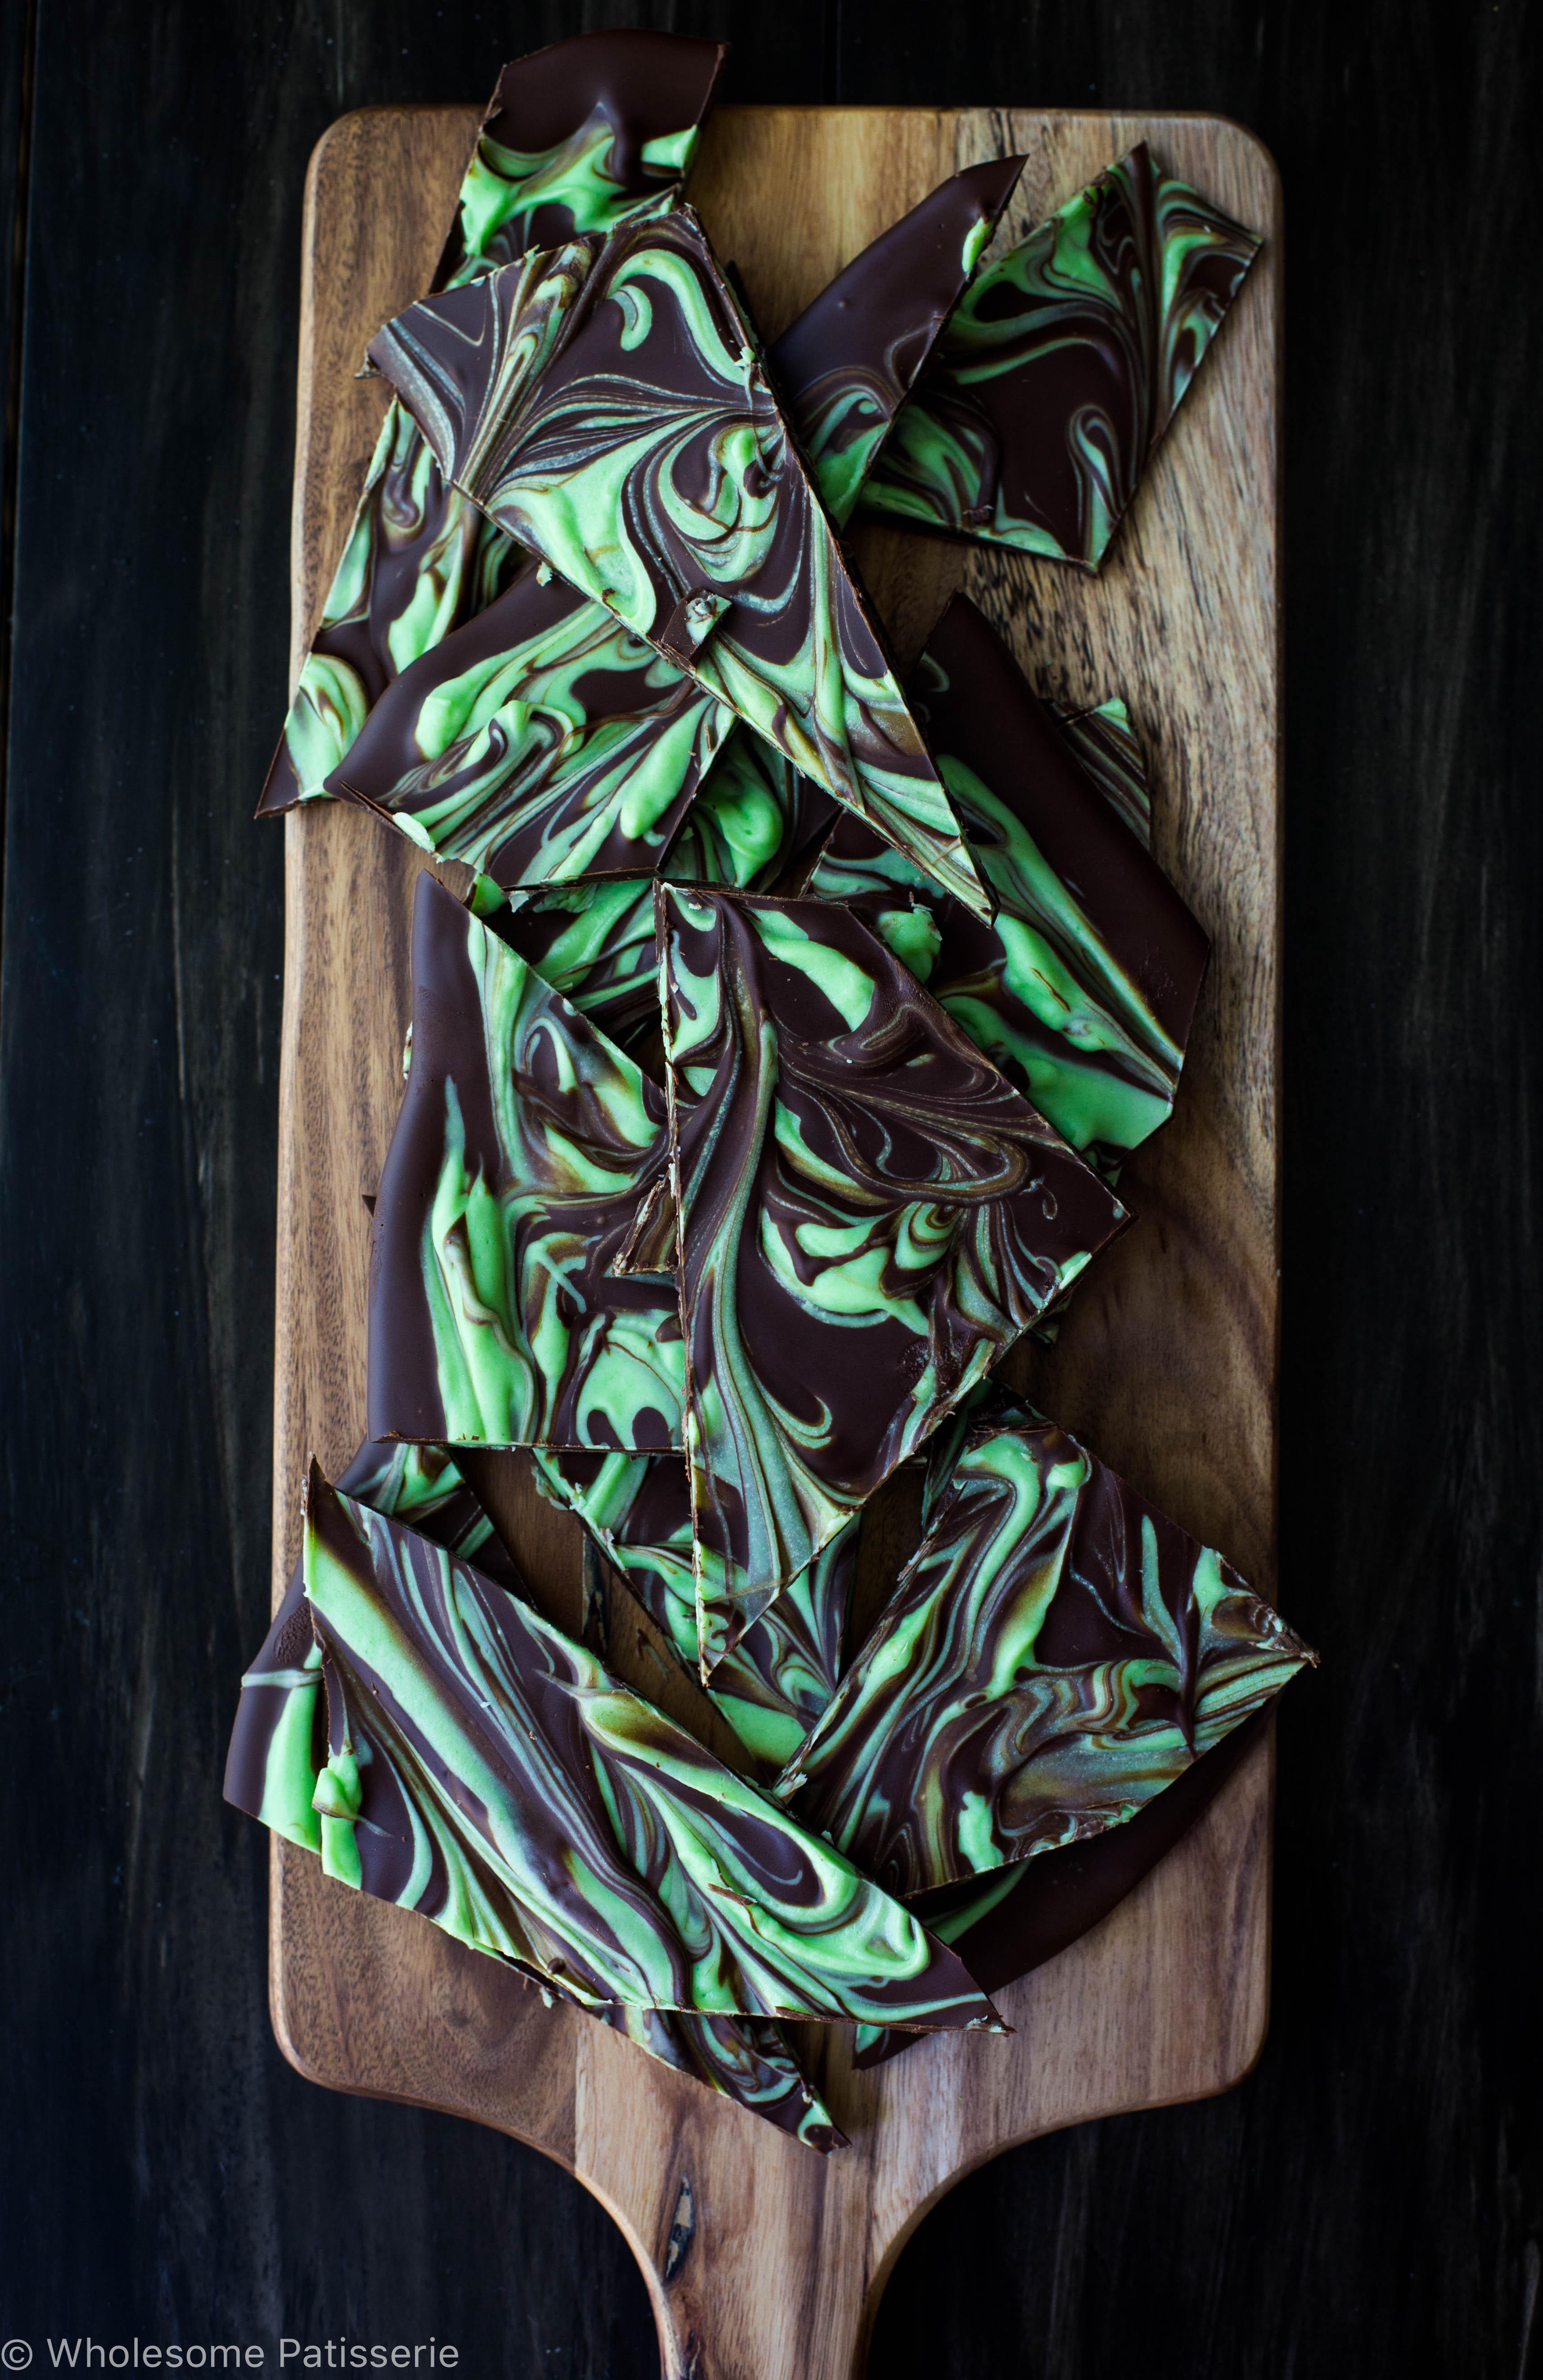 Double Chocolate Peppermint Bark